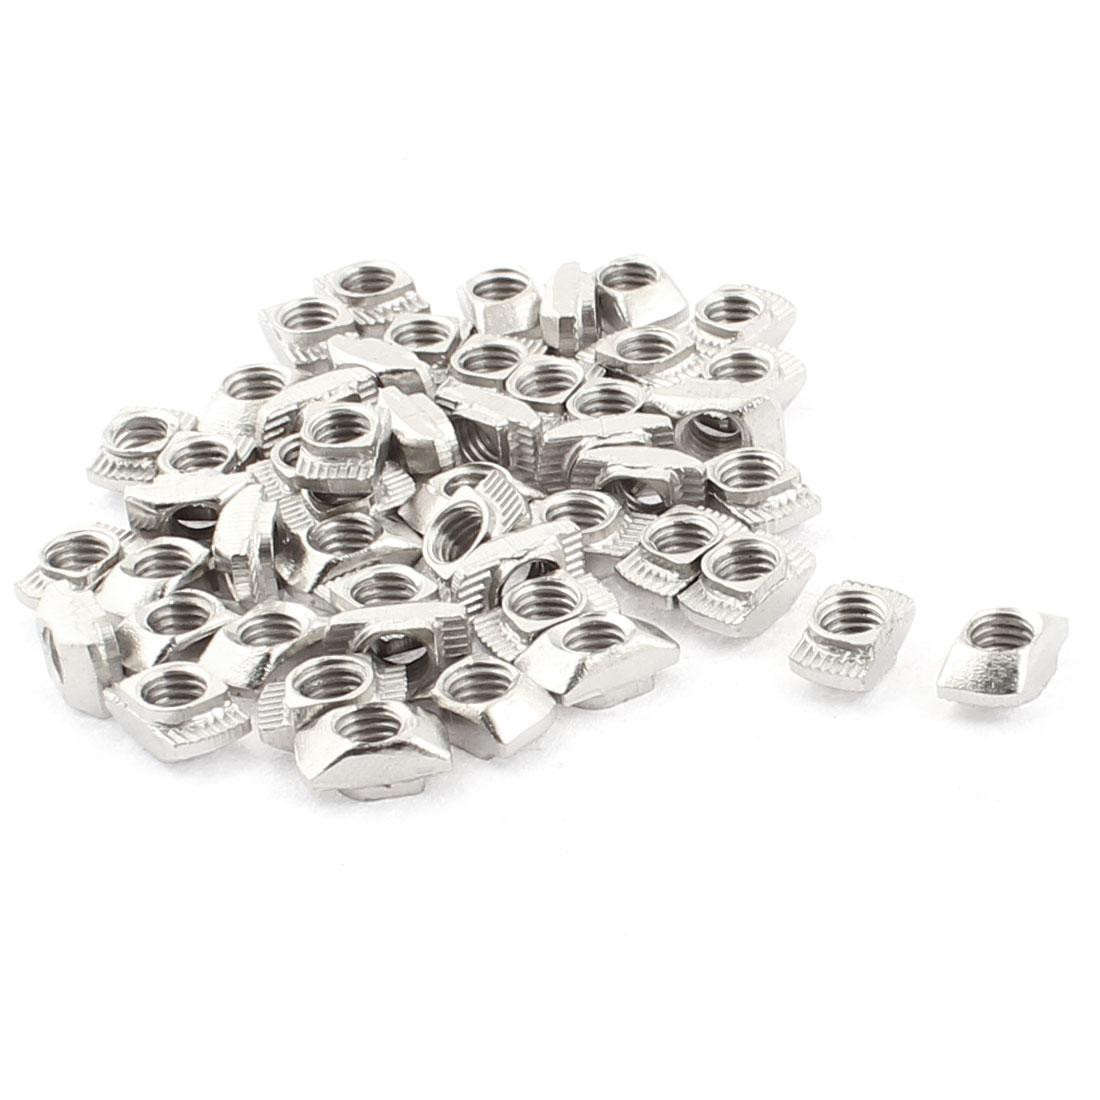 M5 Female Thread Metal T Slot Hammer Head Drop in Nut Silver Tone 50pcs